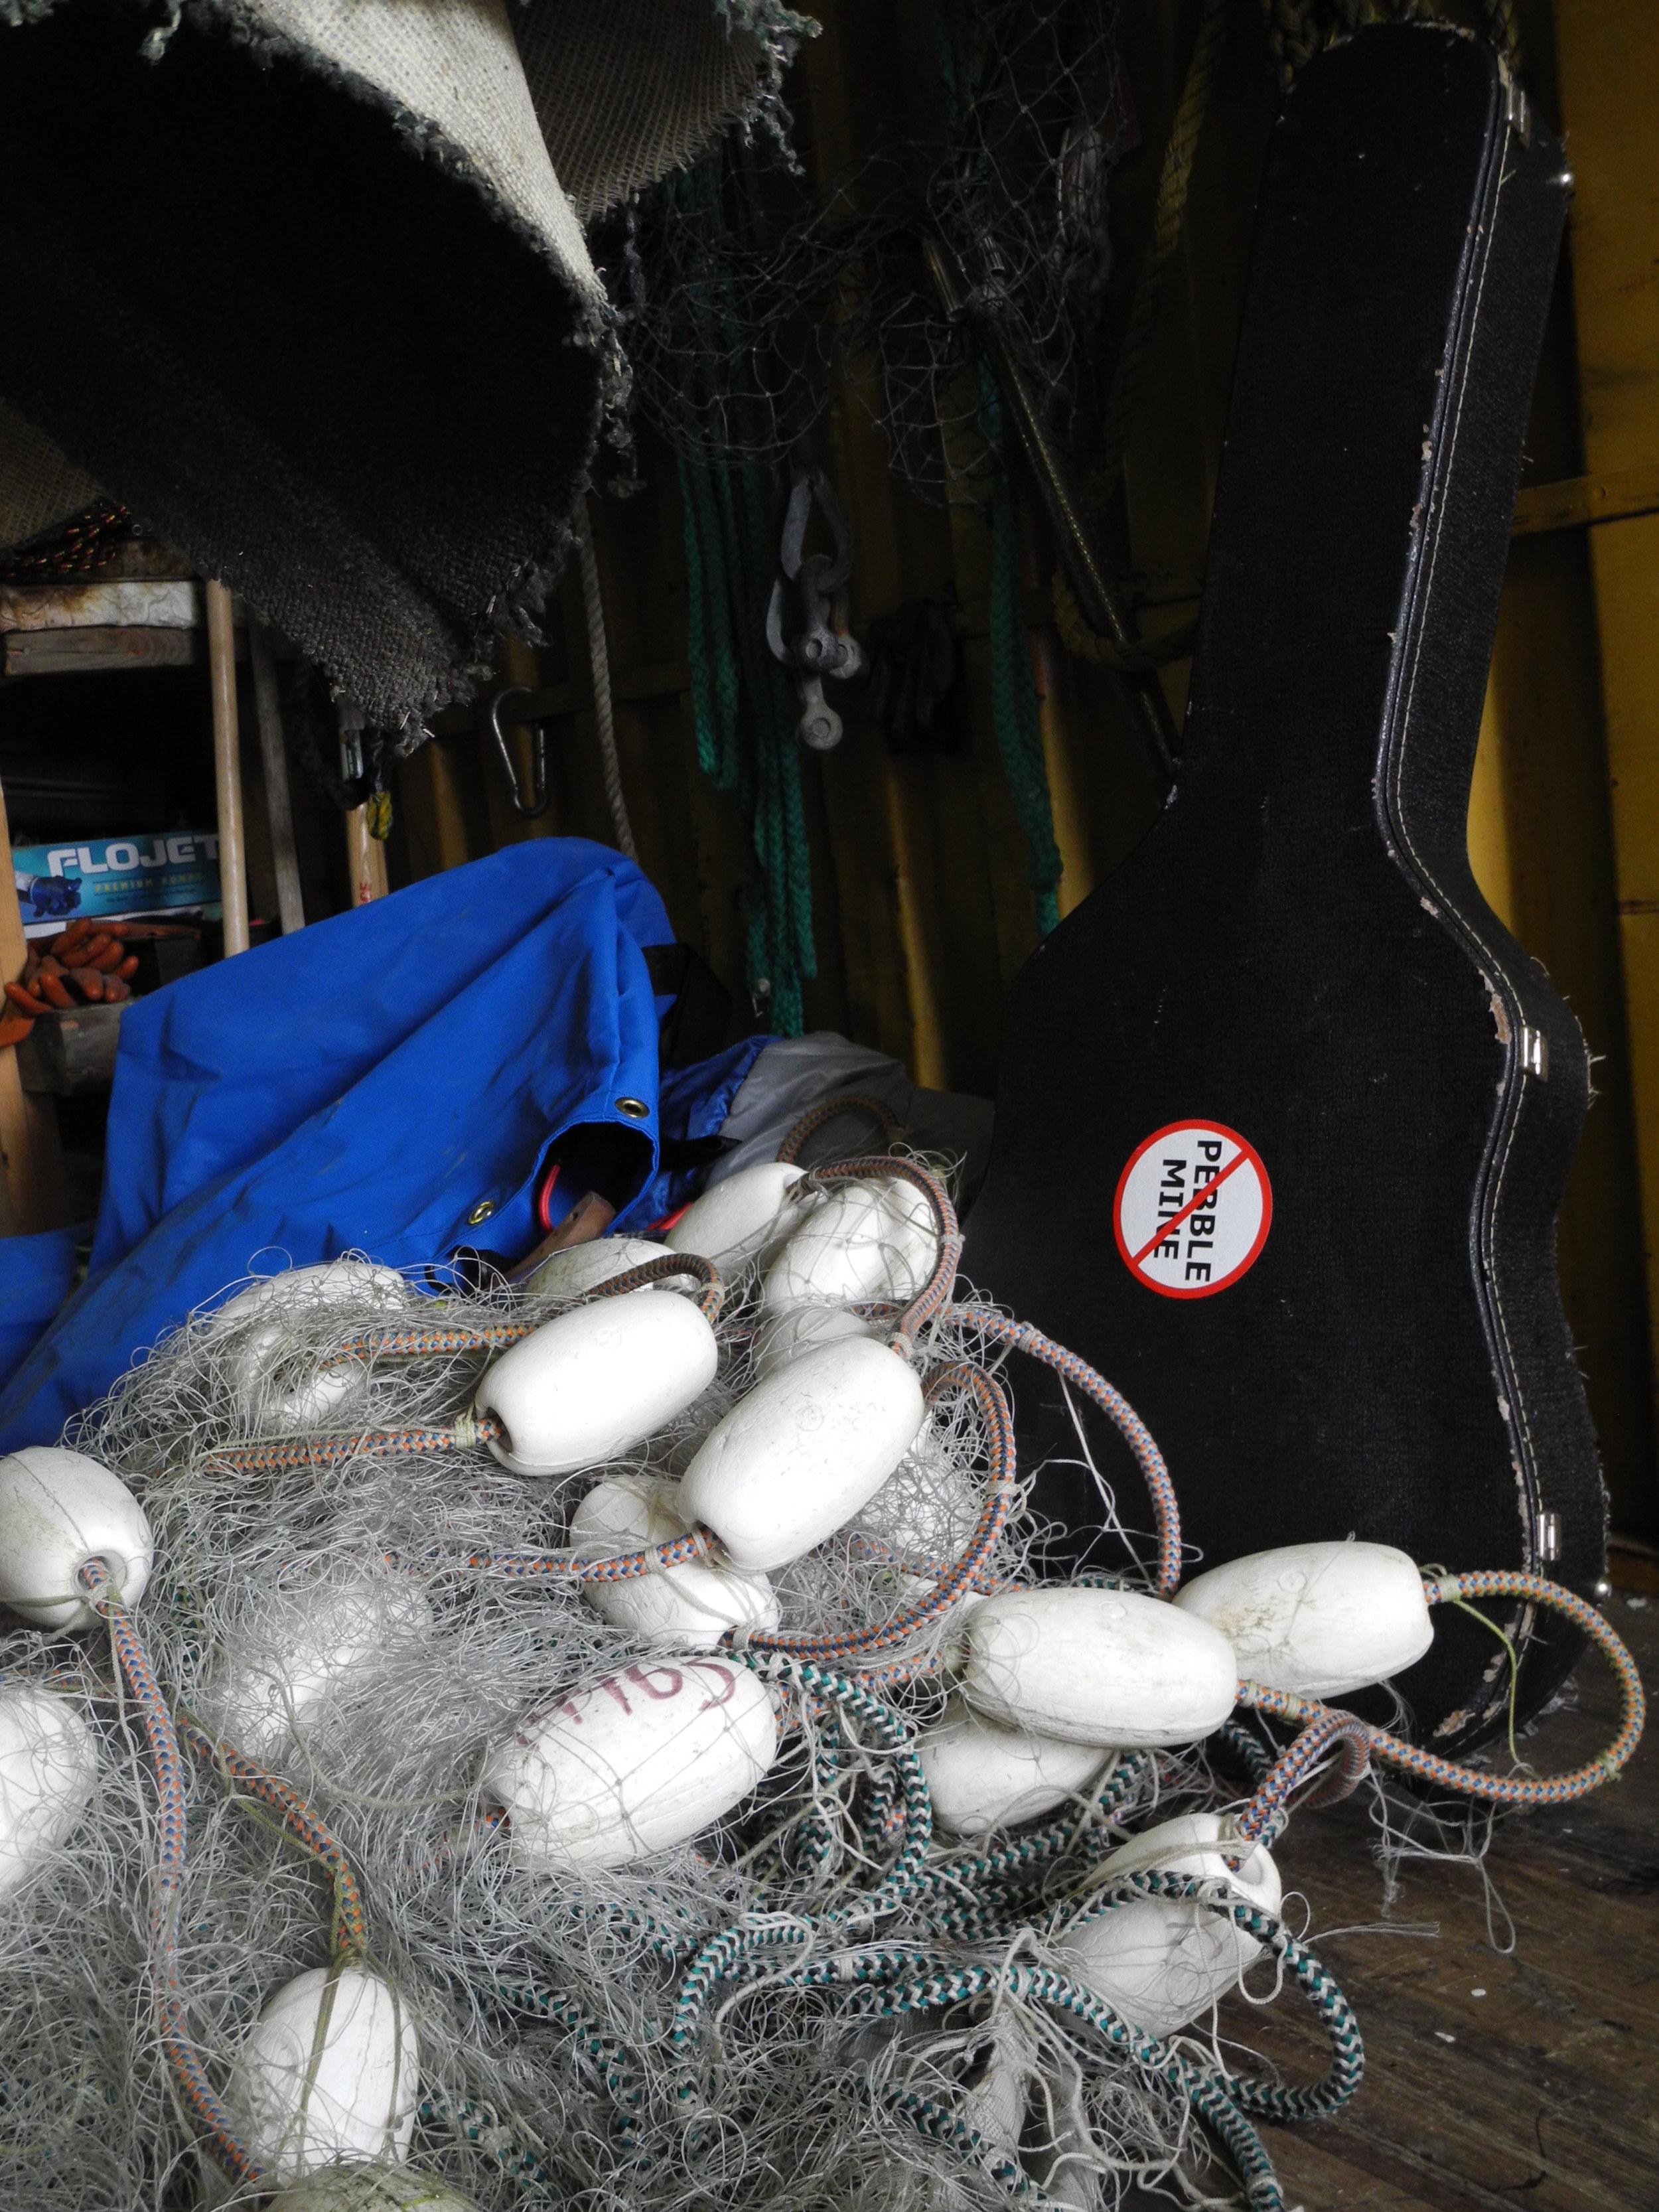 Fishing net and guitar in Dillingham, AK